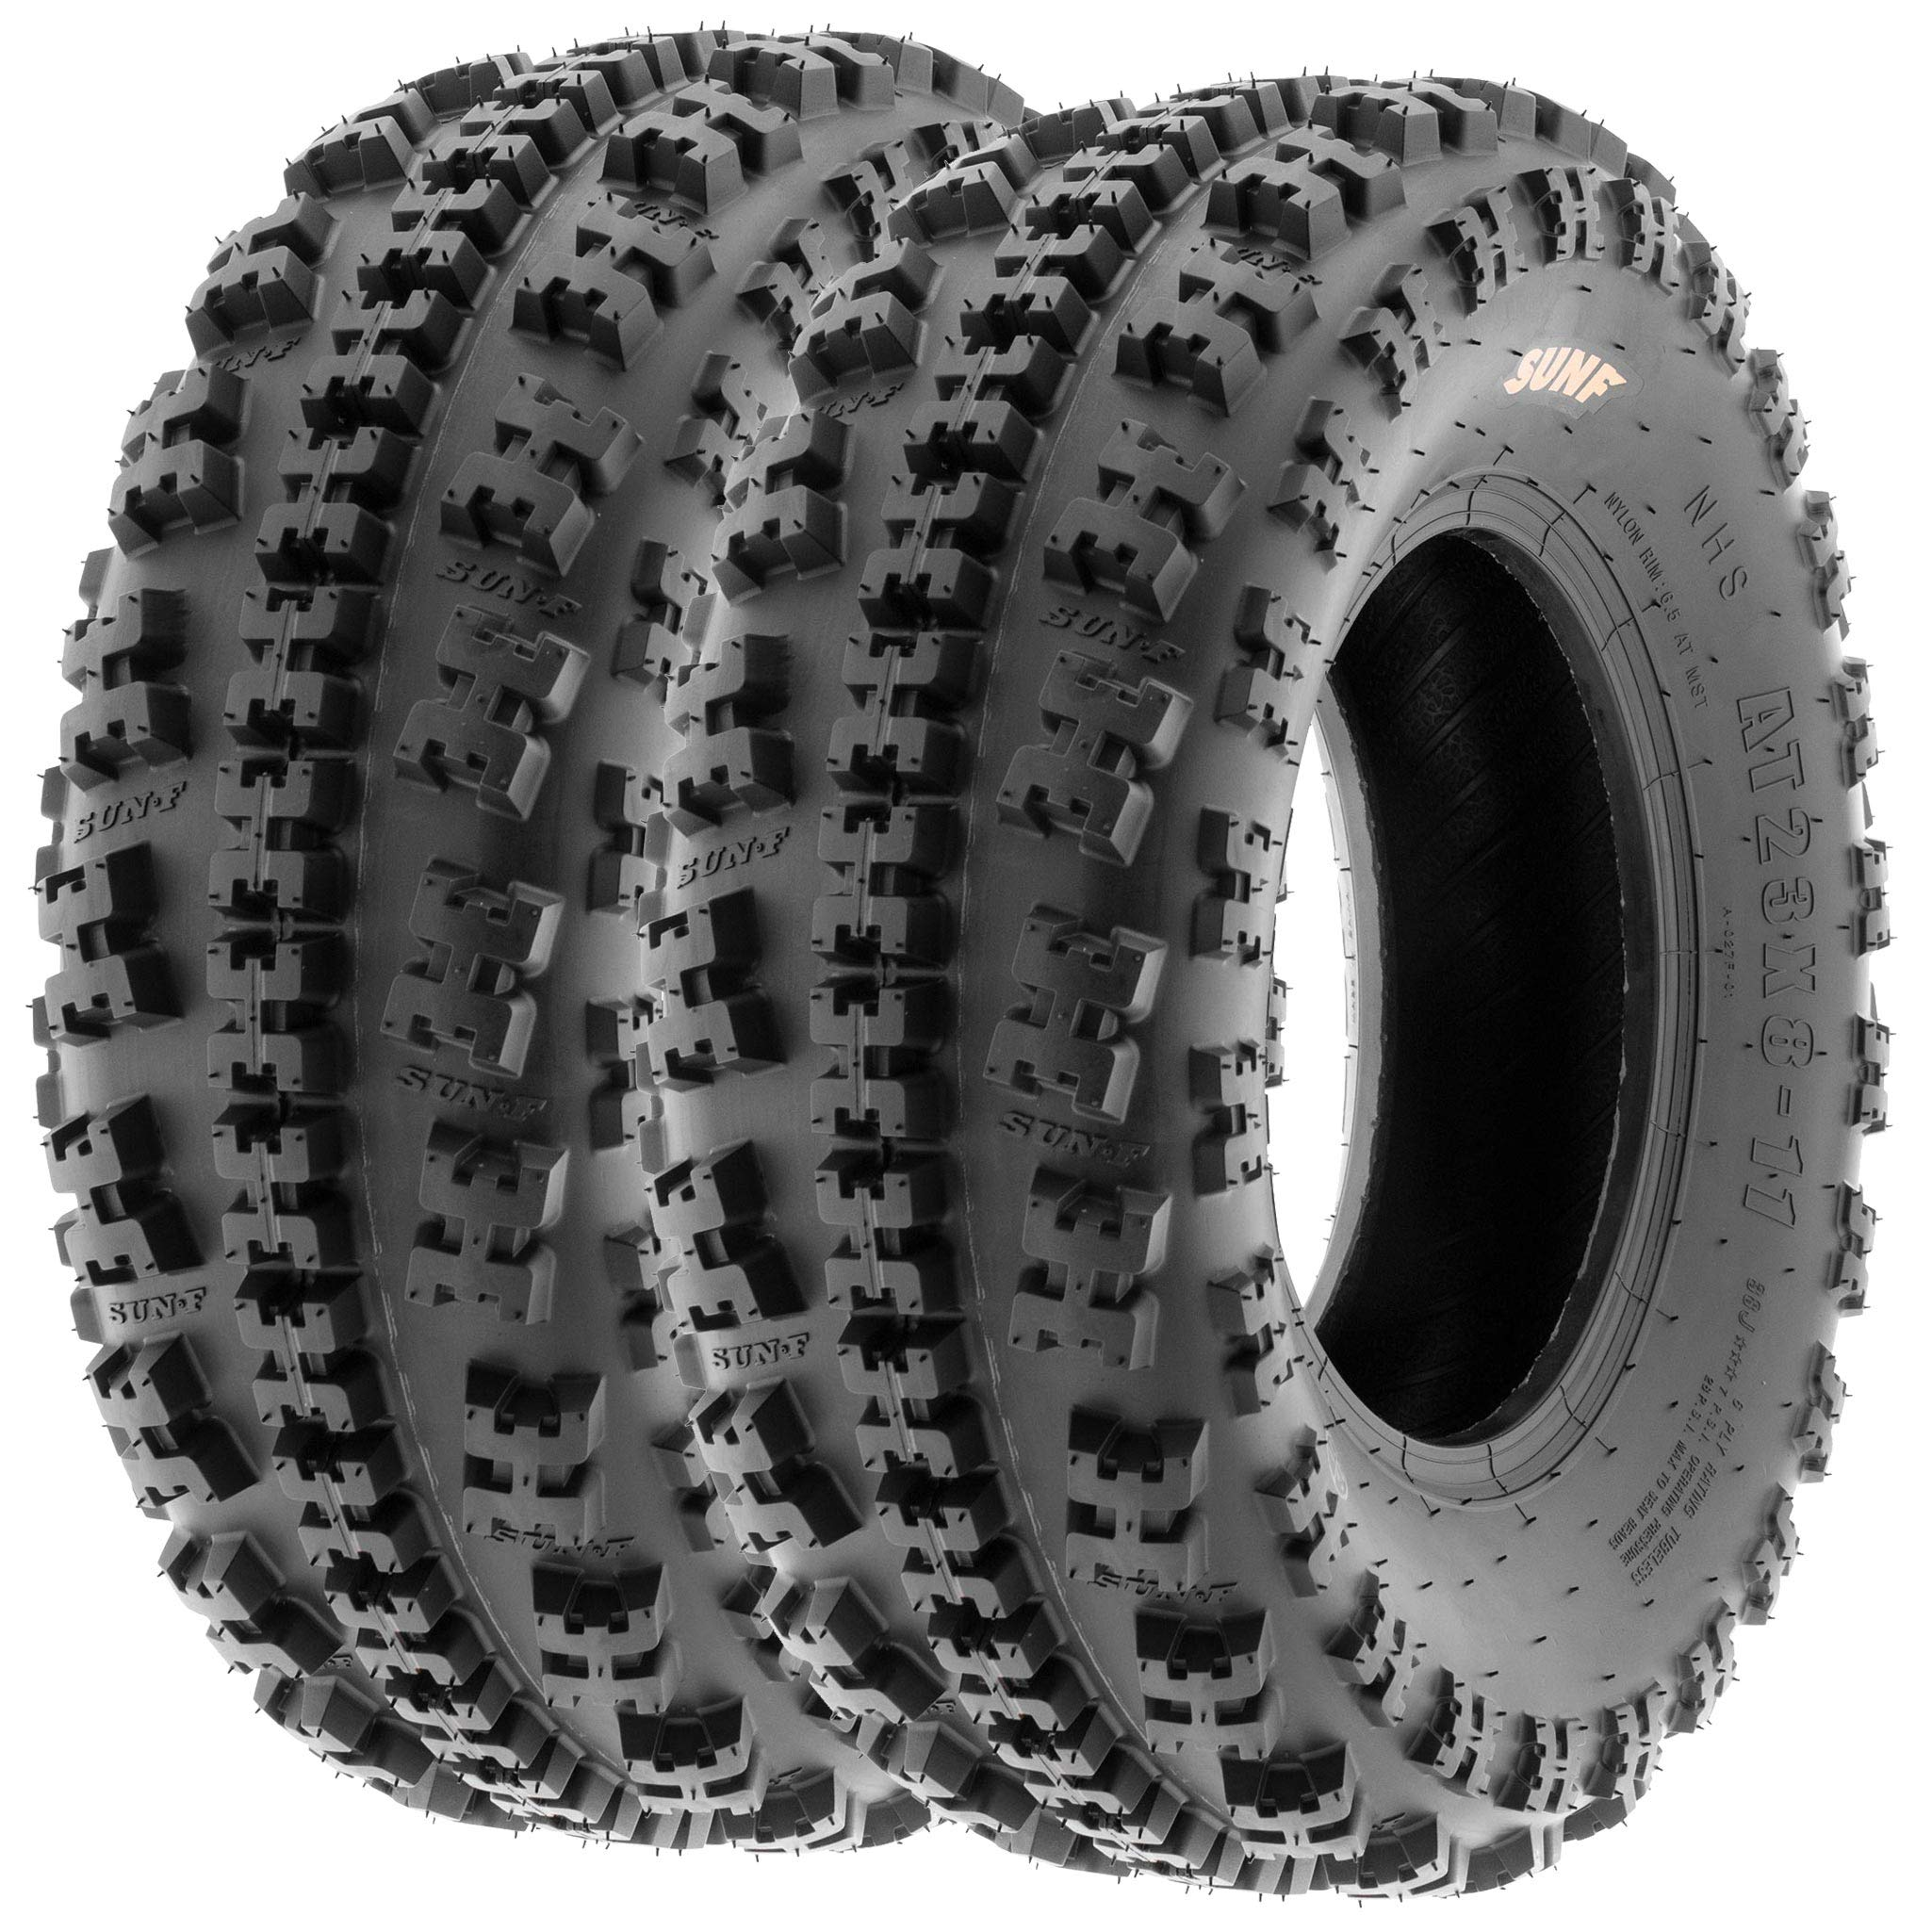 Set of 2 SunF A027 XC ATV UTV Knobby Sport Tires 19x7-8, 6 PR, Tubeless by SUNF